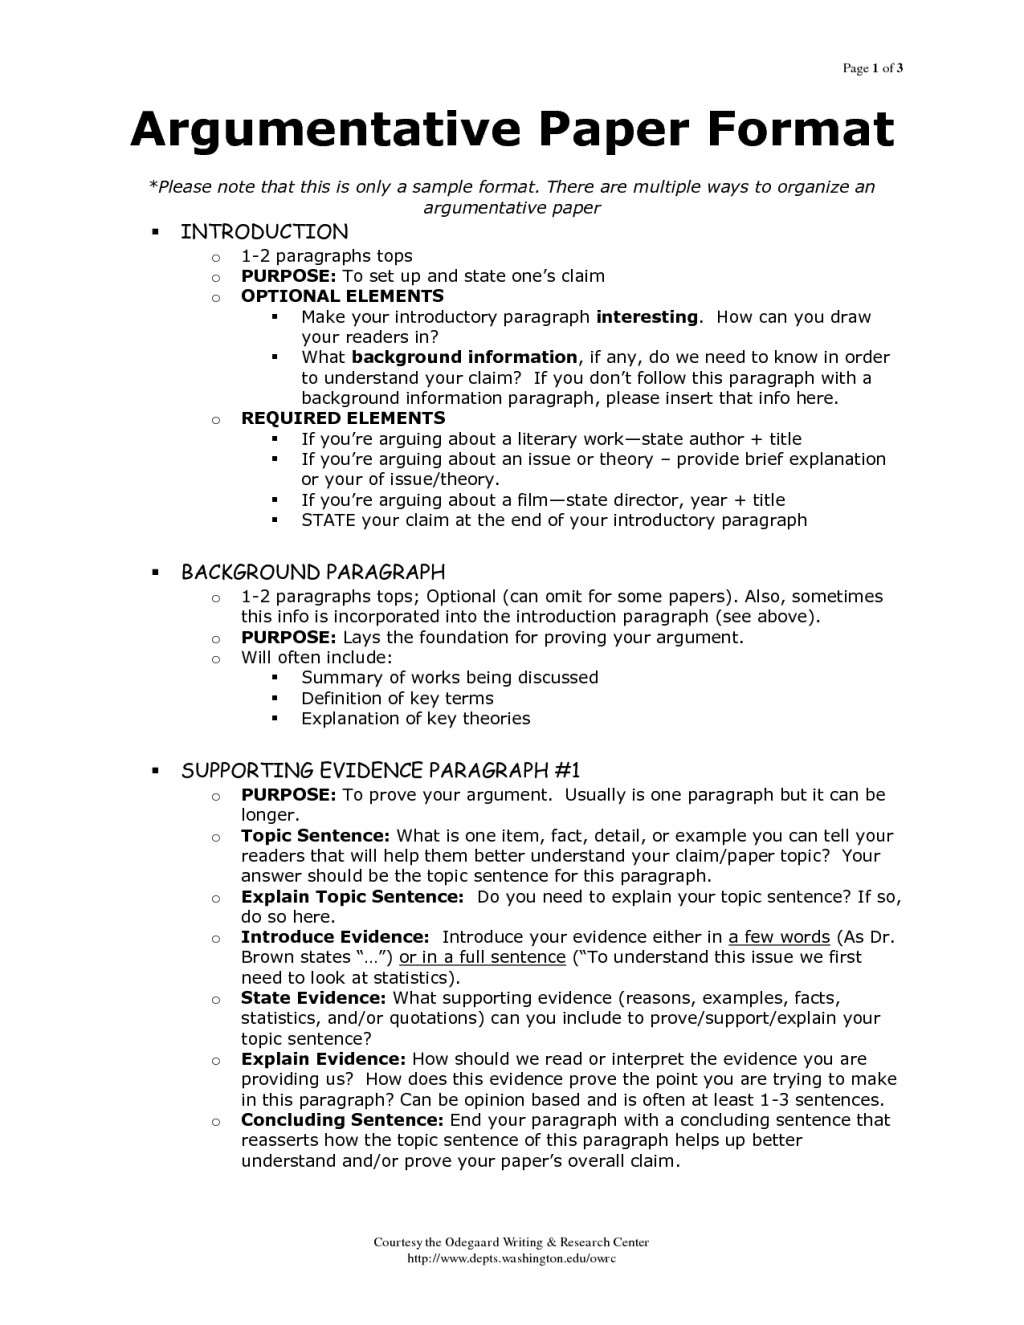 006 Sample Argumentative Essay Awful Outline Middle School Apa Format Ap Argument Prompts Large